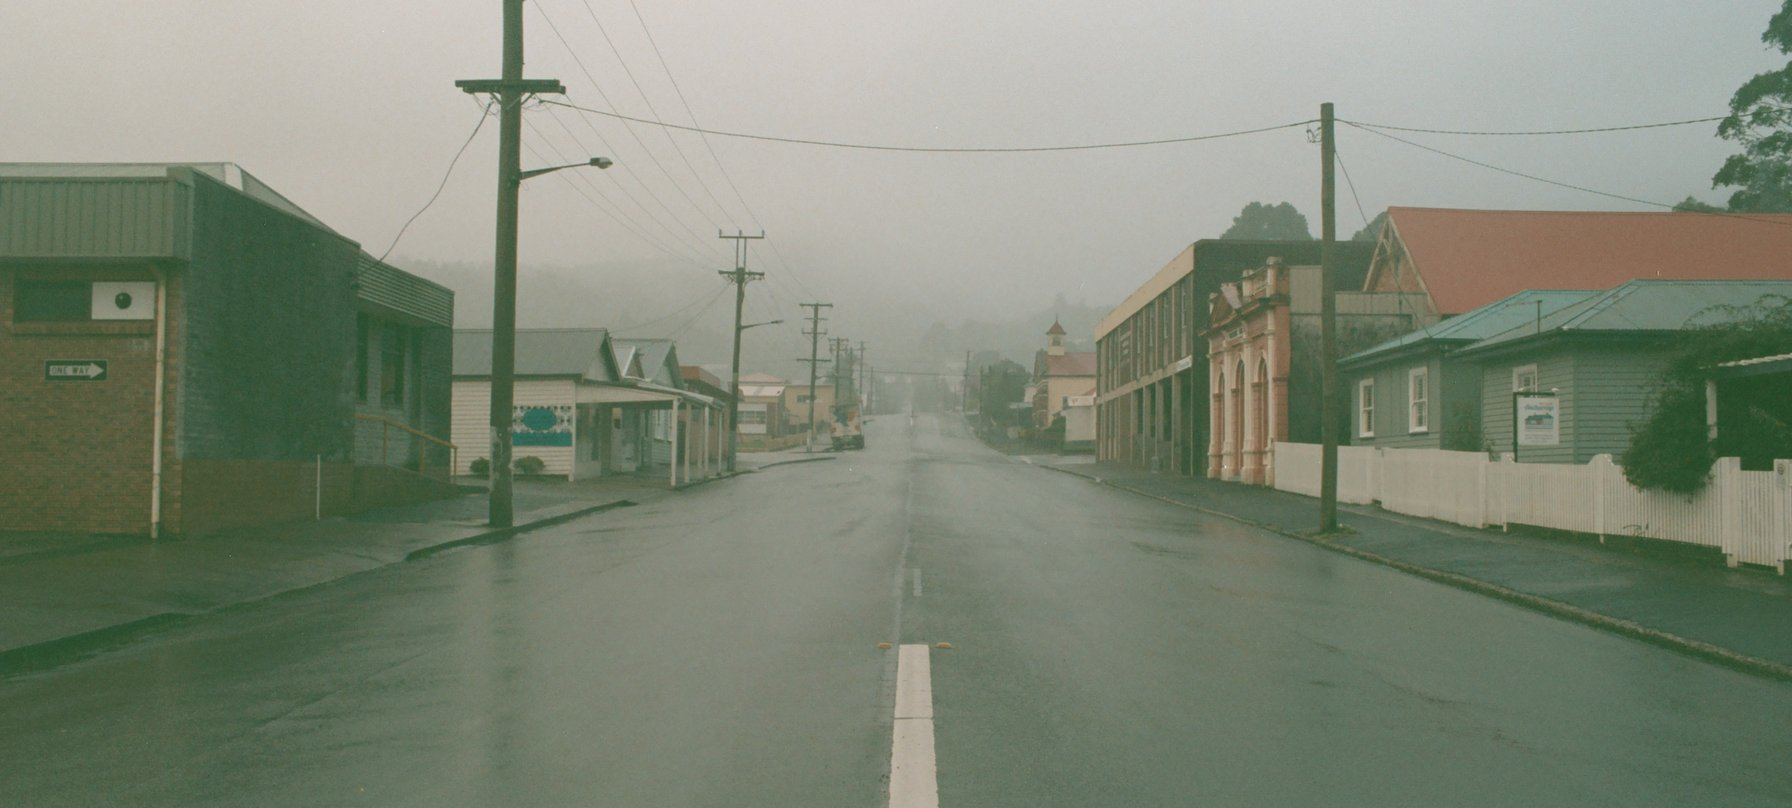 Foggy street in Queenstown